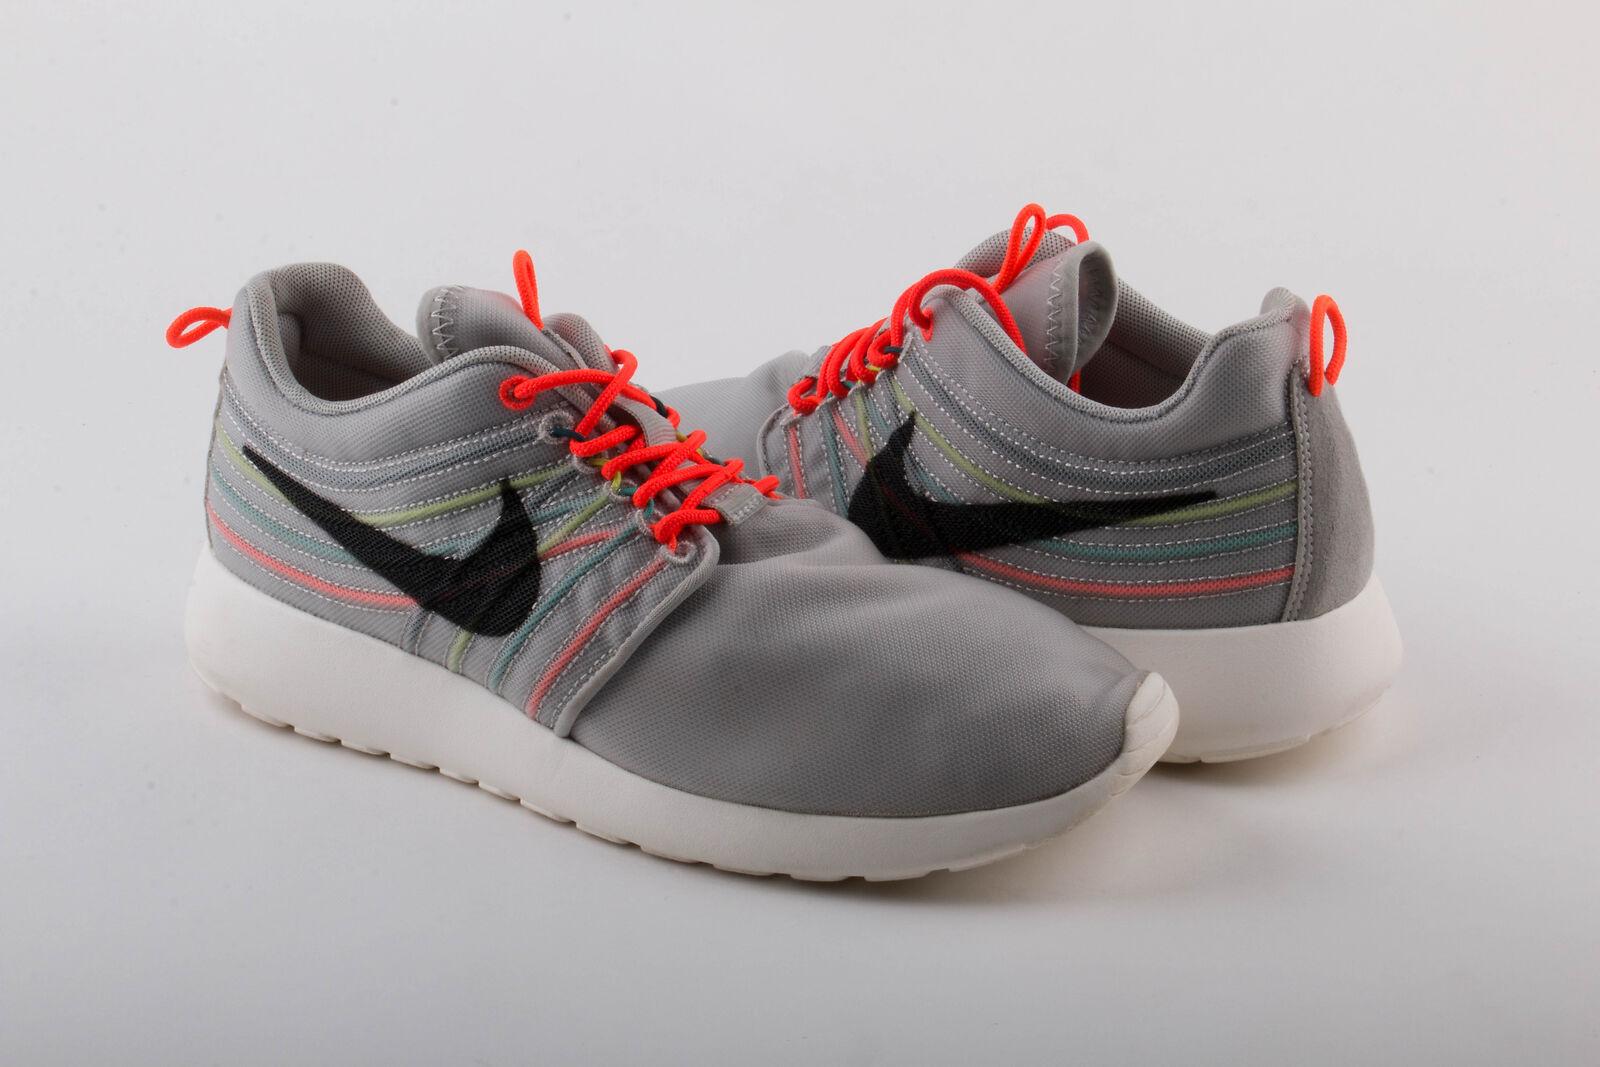 Nike Mens Rosherun DYN FW QS Strate Grey/Crimson 580579-061 Size 8 Pre-owned